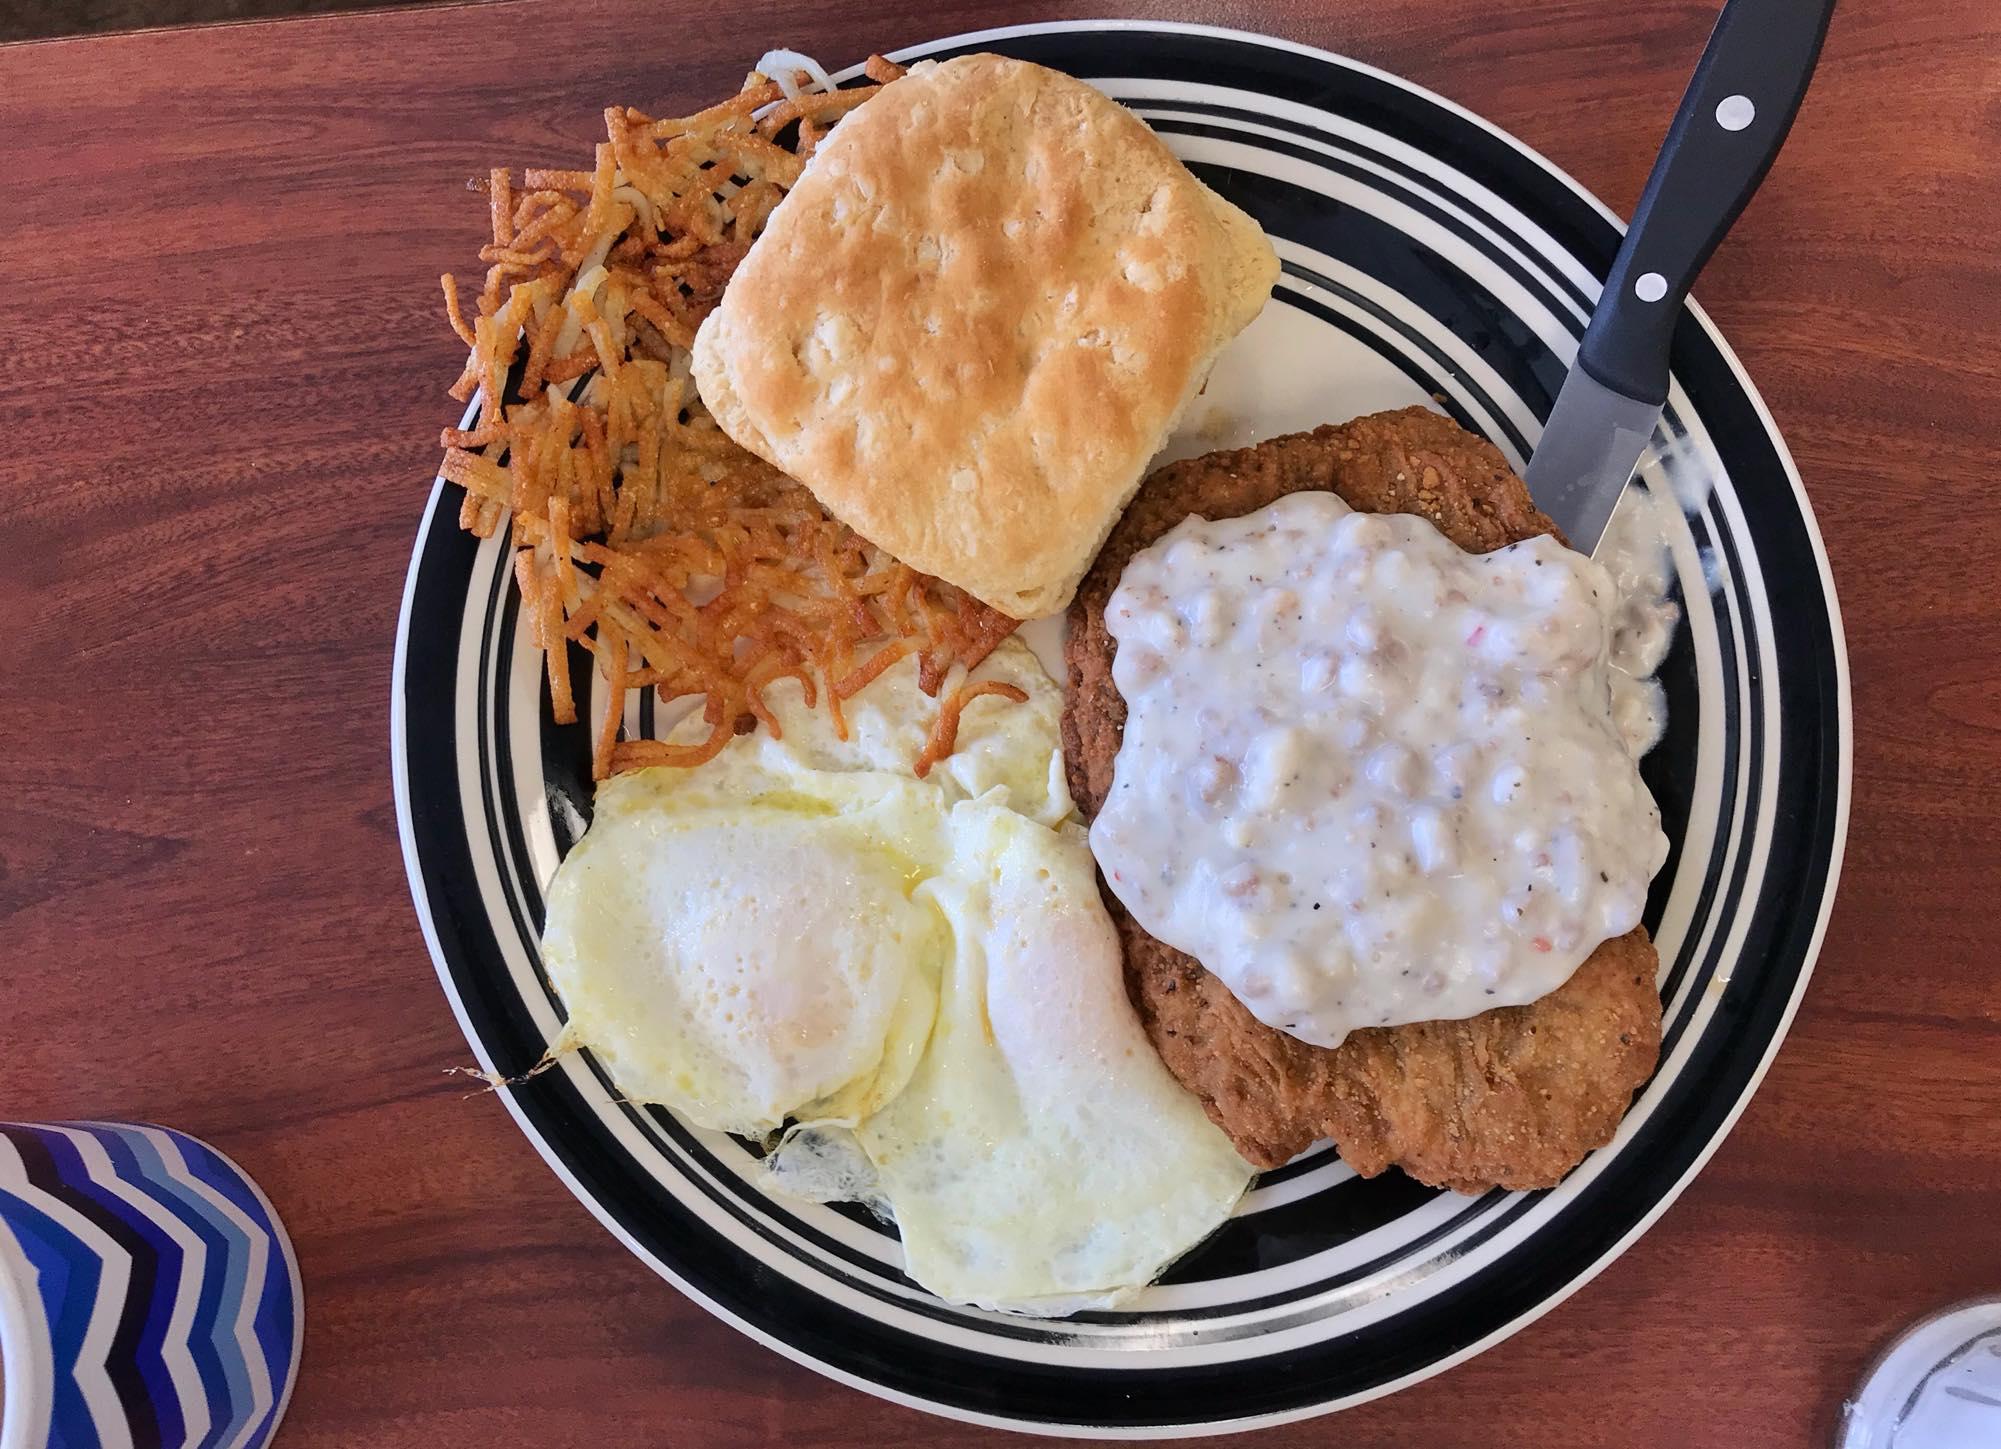 Howies-Cafe-Country-Fried-Steak.jpg